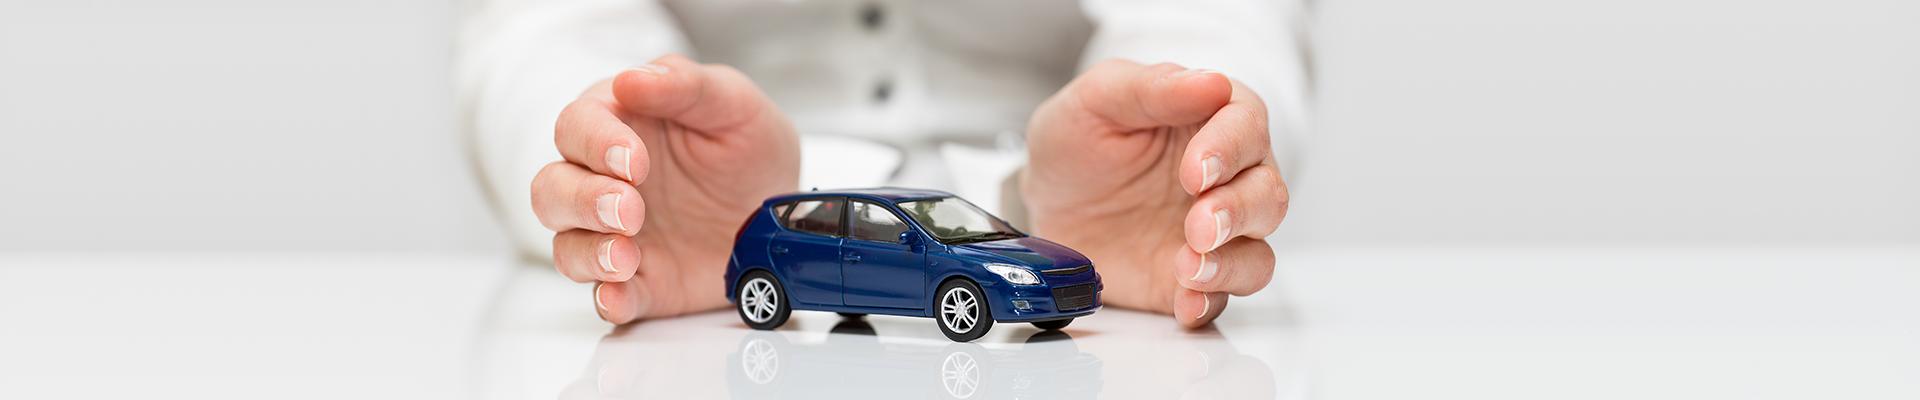 Auto Insurance FAQs | Caser Expats Insurance